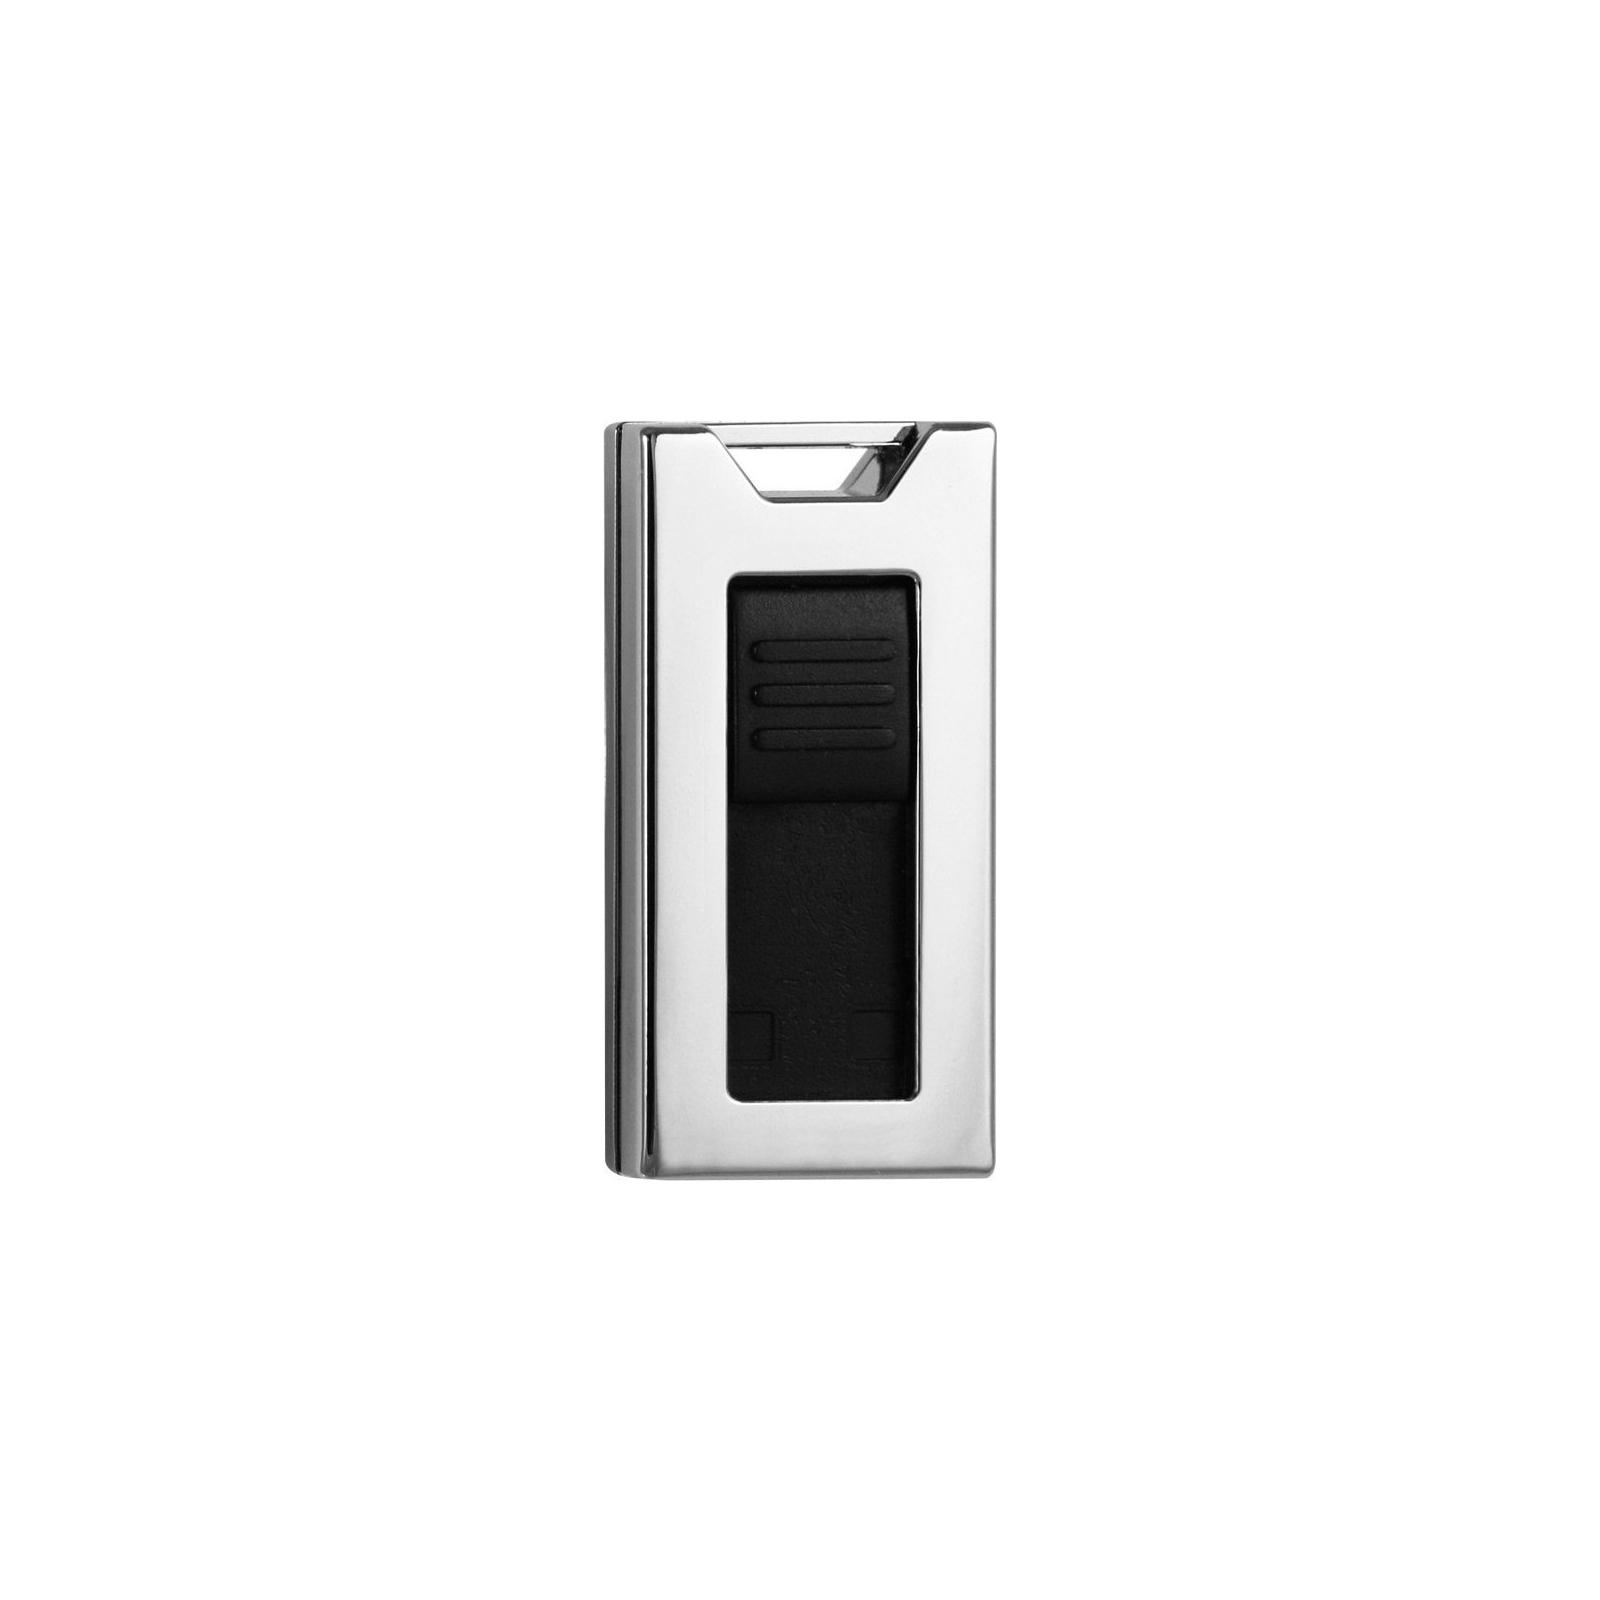 USB флеш накопитель Silicon Power 16Gb Touch 850 titanium (SP016GBUF2850V1T) изображение 3